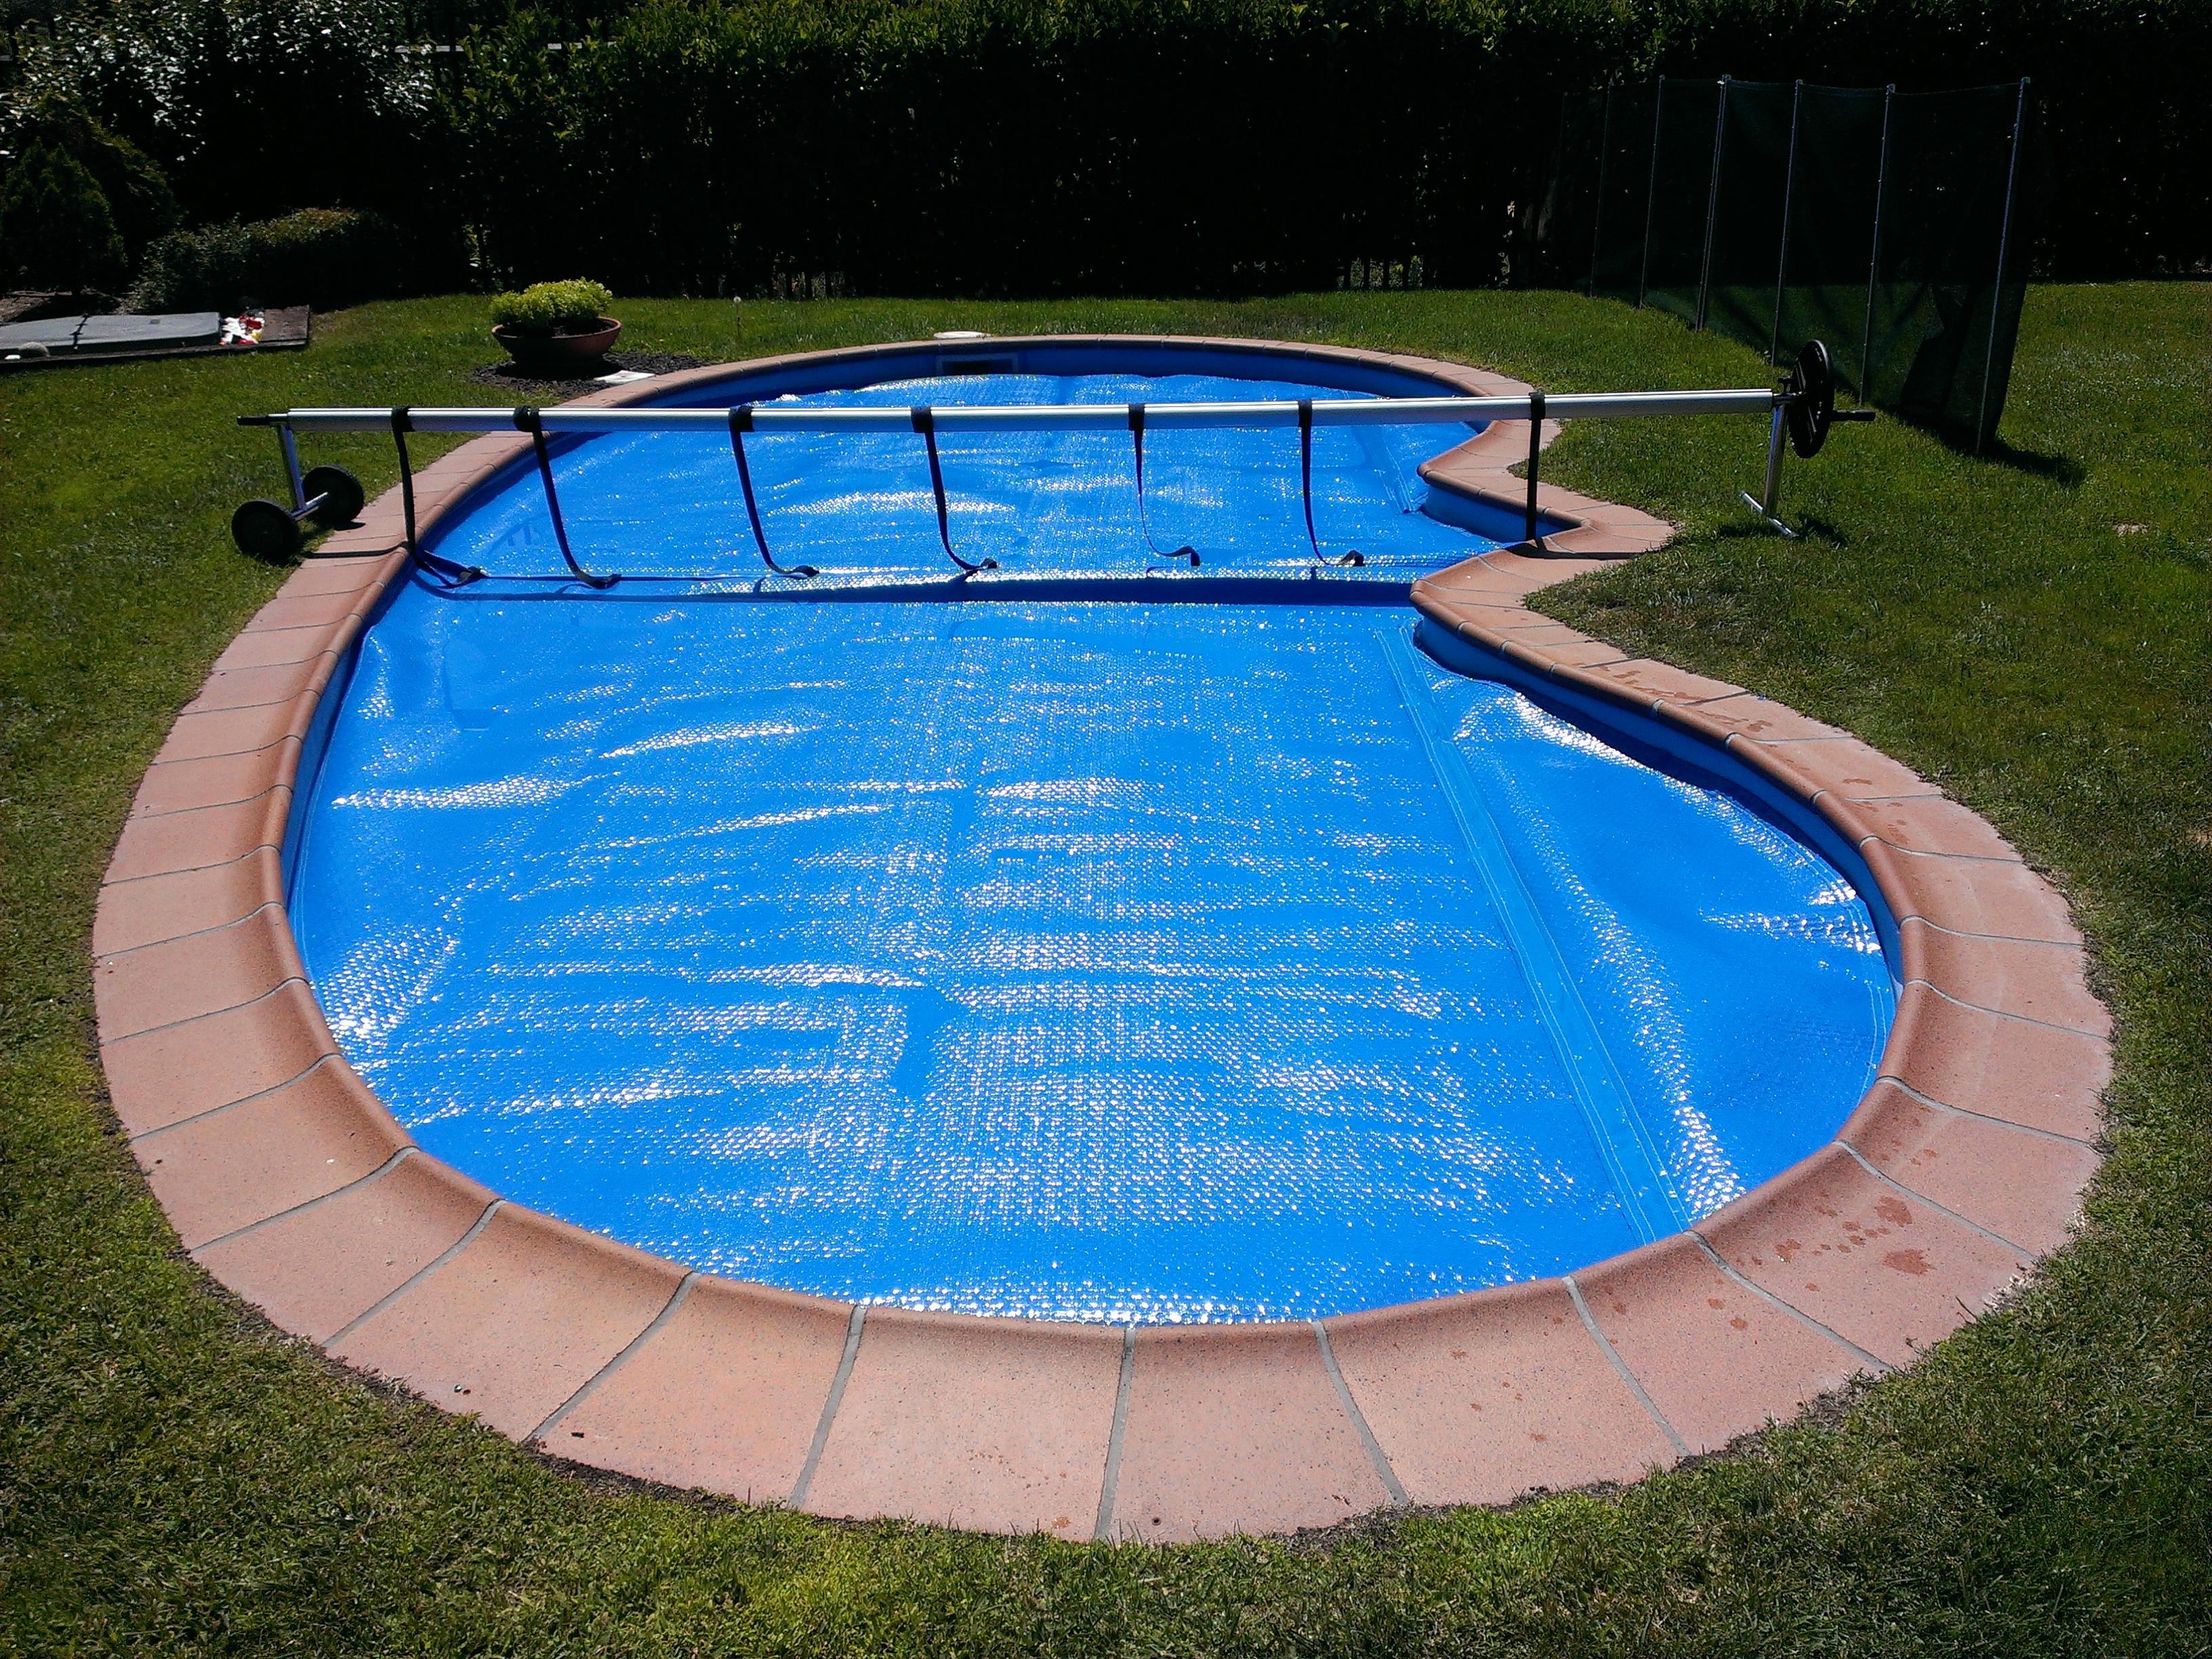 Global blue ink instala una bomba de calor en tu piscina for Bombas de calor piscinas